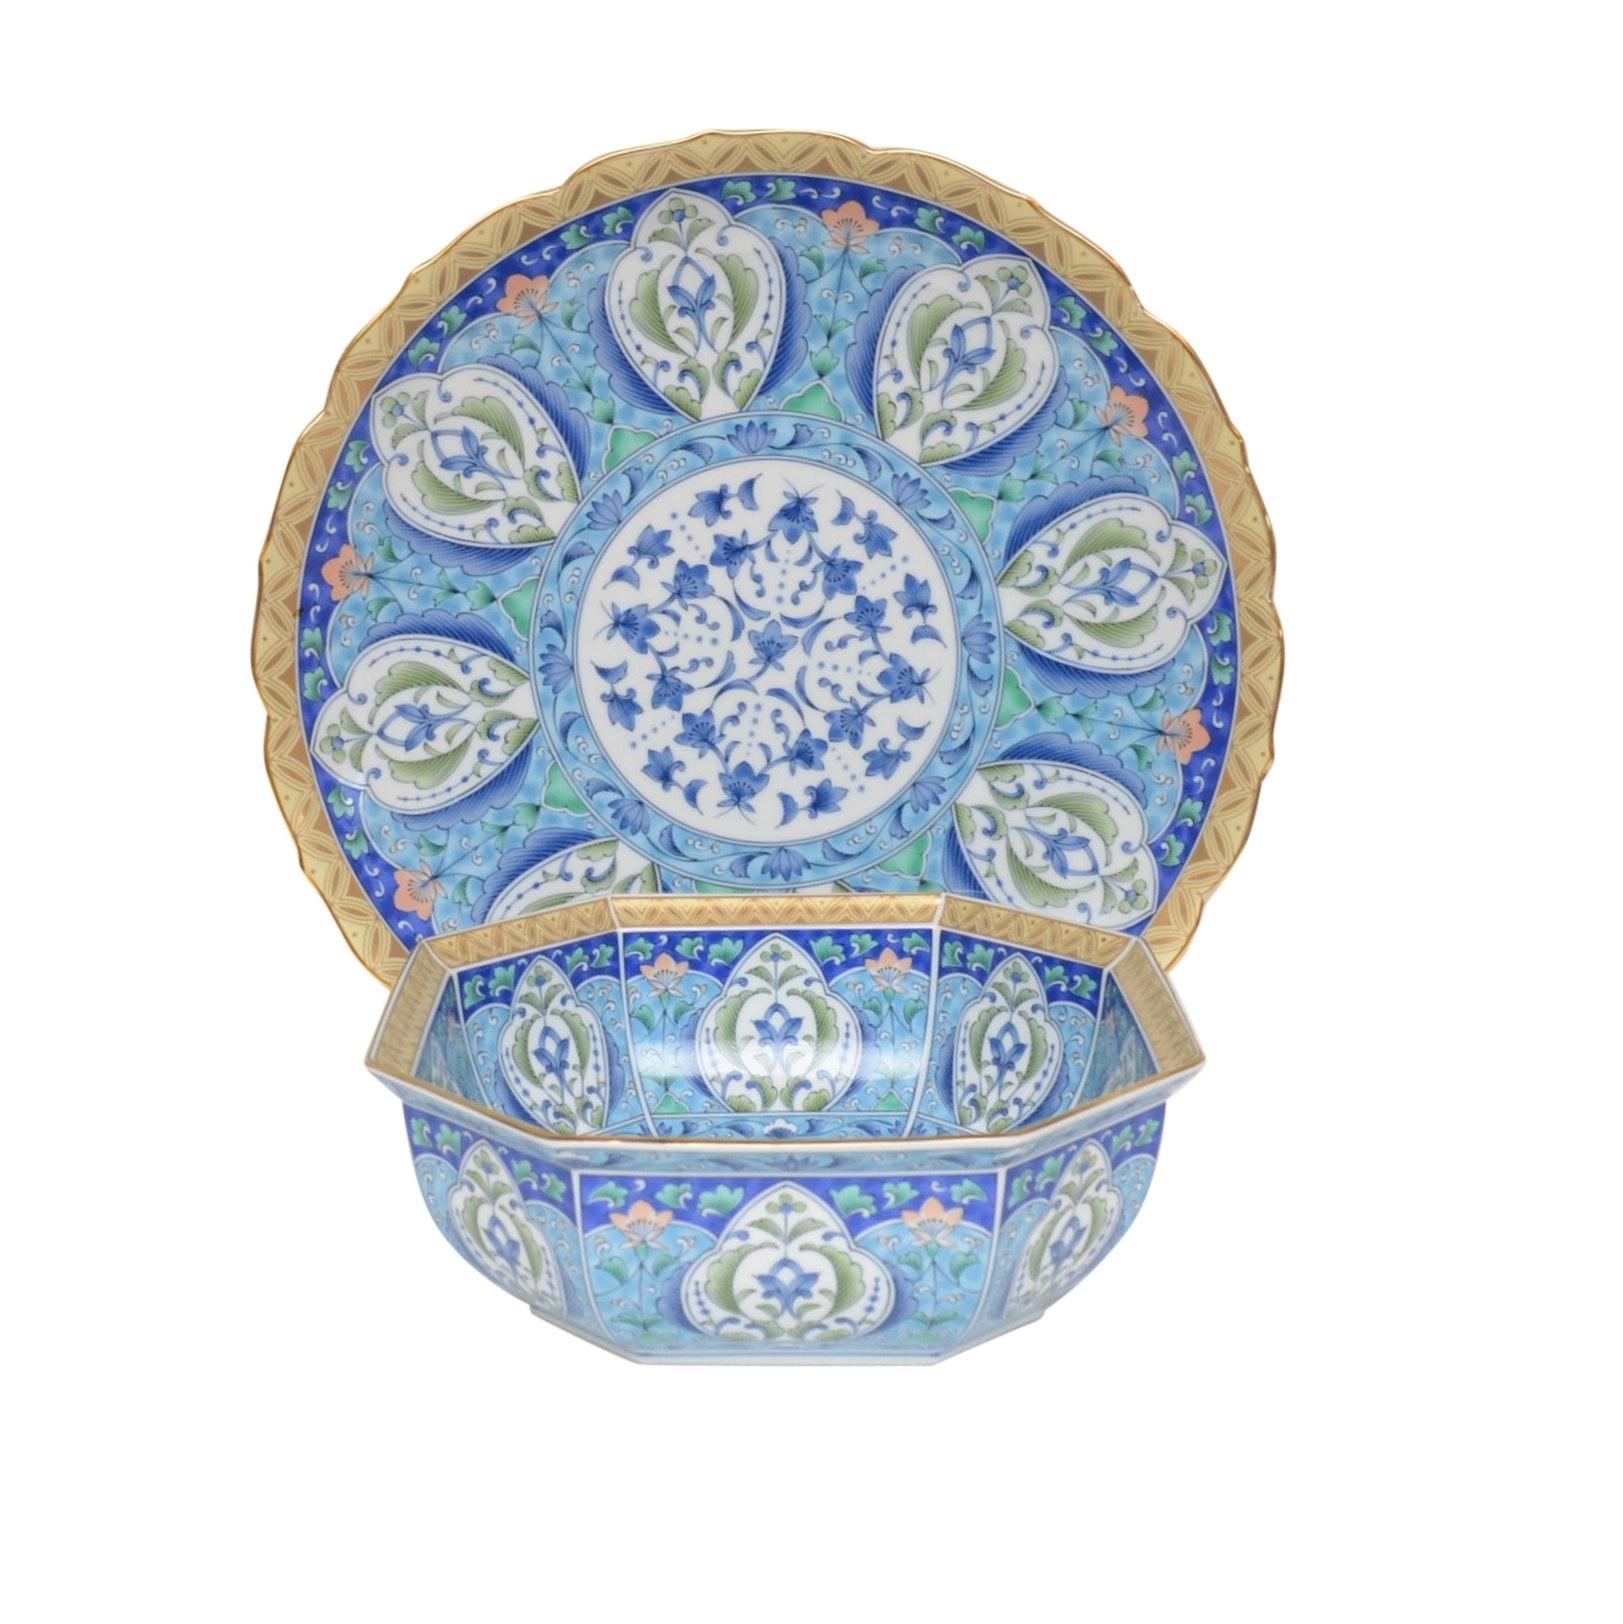 Japanese Painted Bone China Platter and Bowl